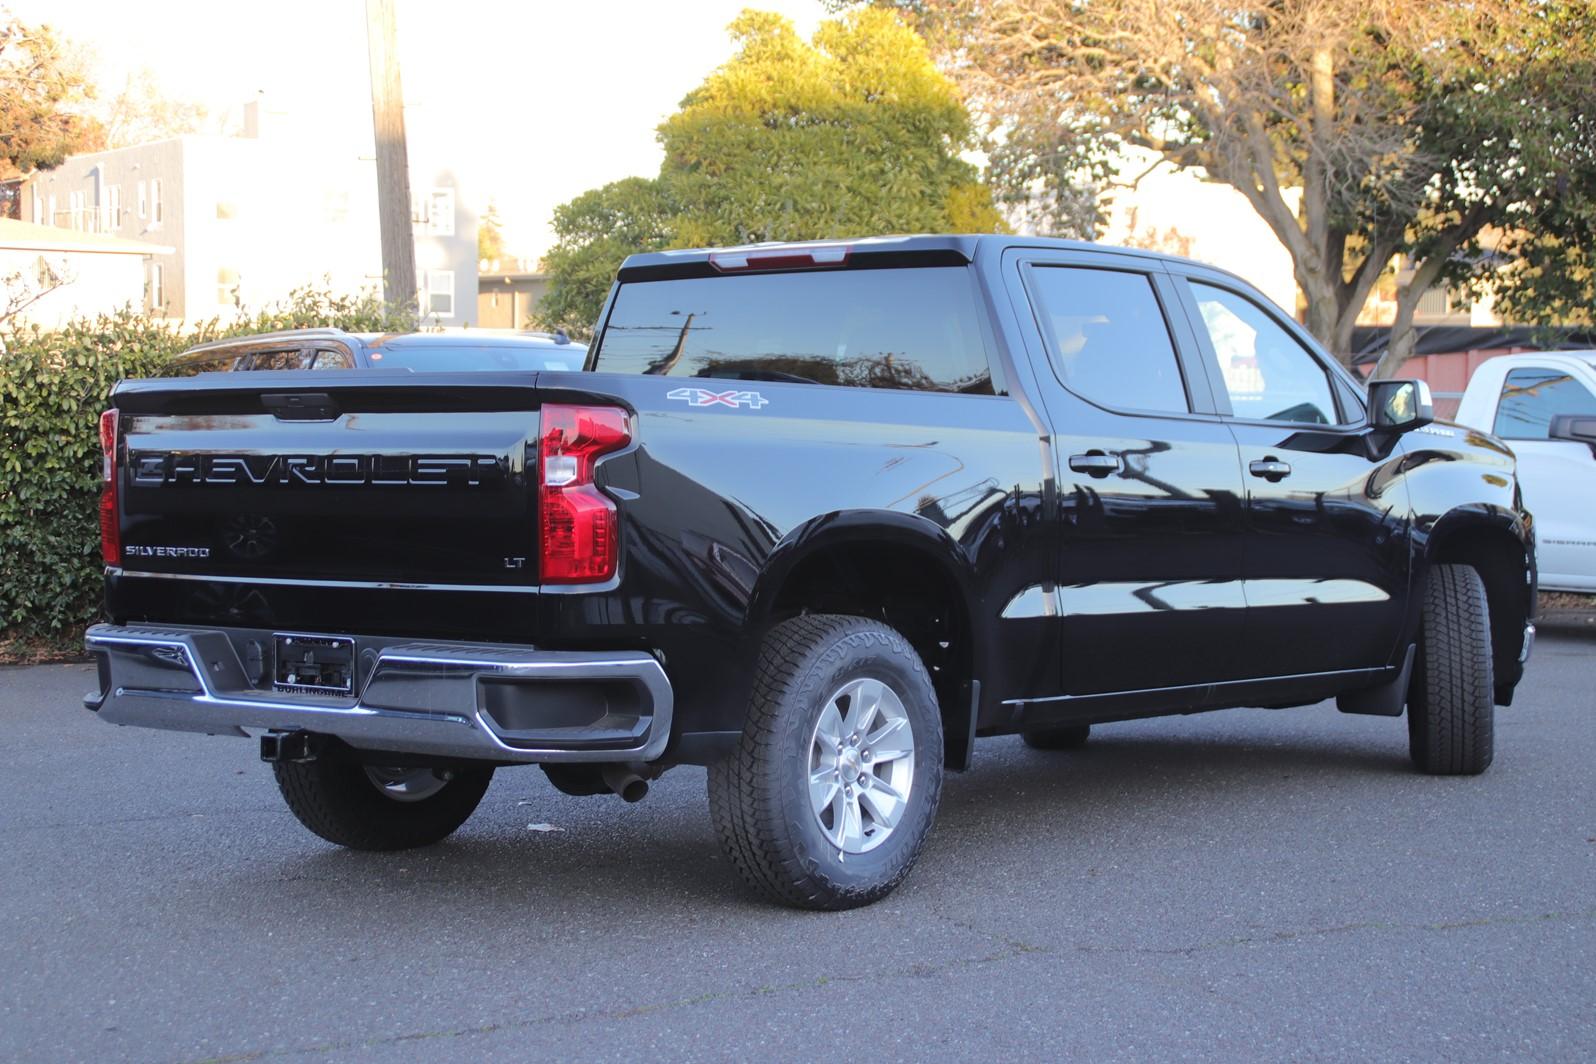 2021 Chevrolet Silverado 1500 Crew Cab 4x4, Pickup #C02419 - photo 2